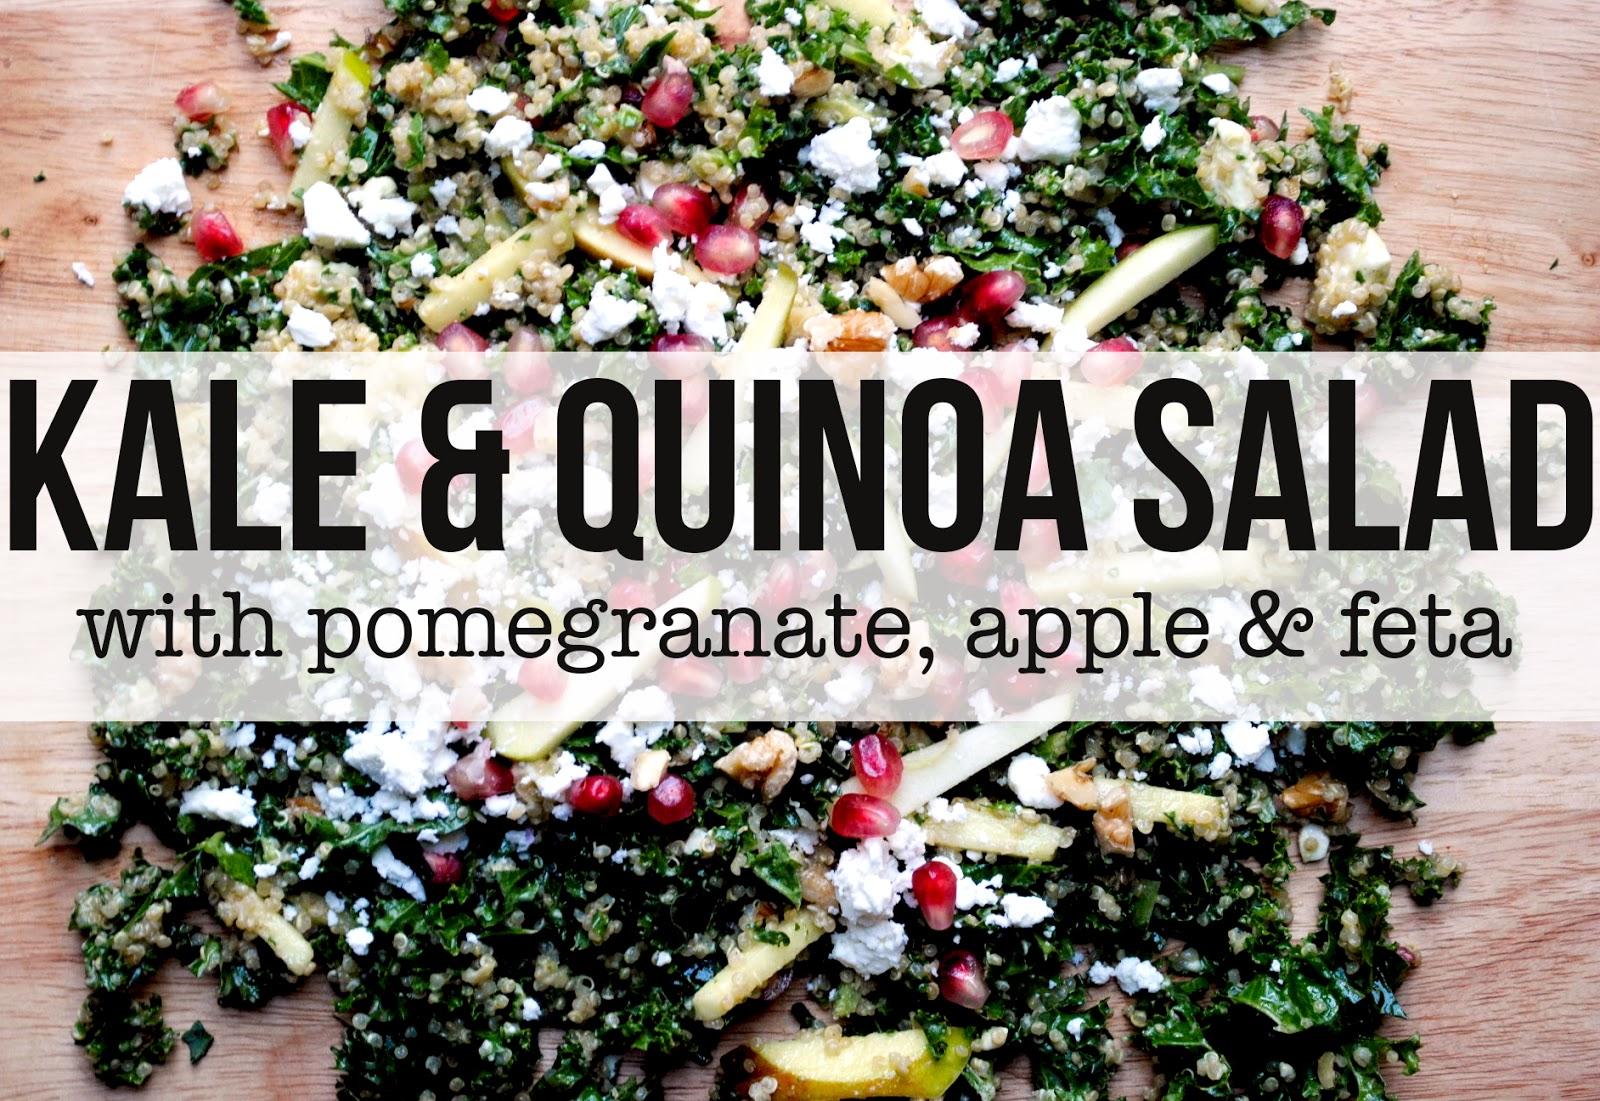 Kale  Quinoa Salad With Pomegranate, Apple  Feta tangerine canteen